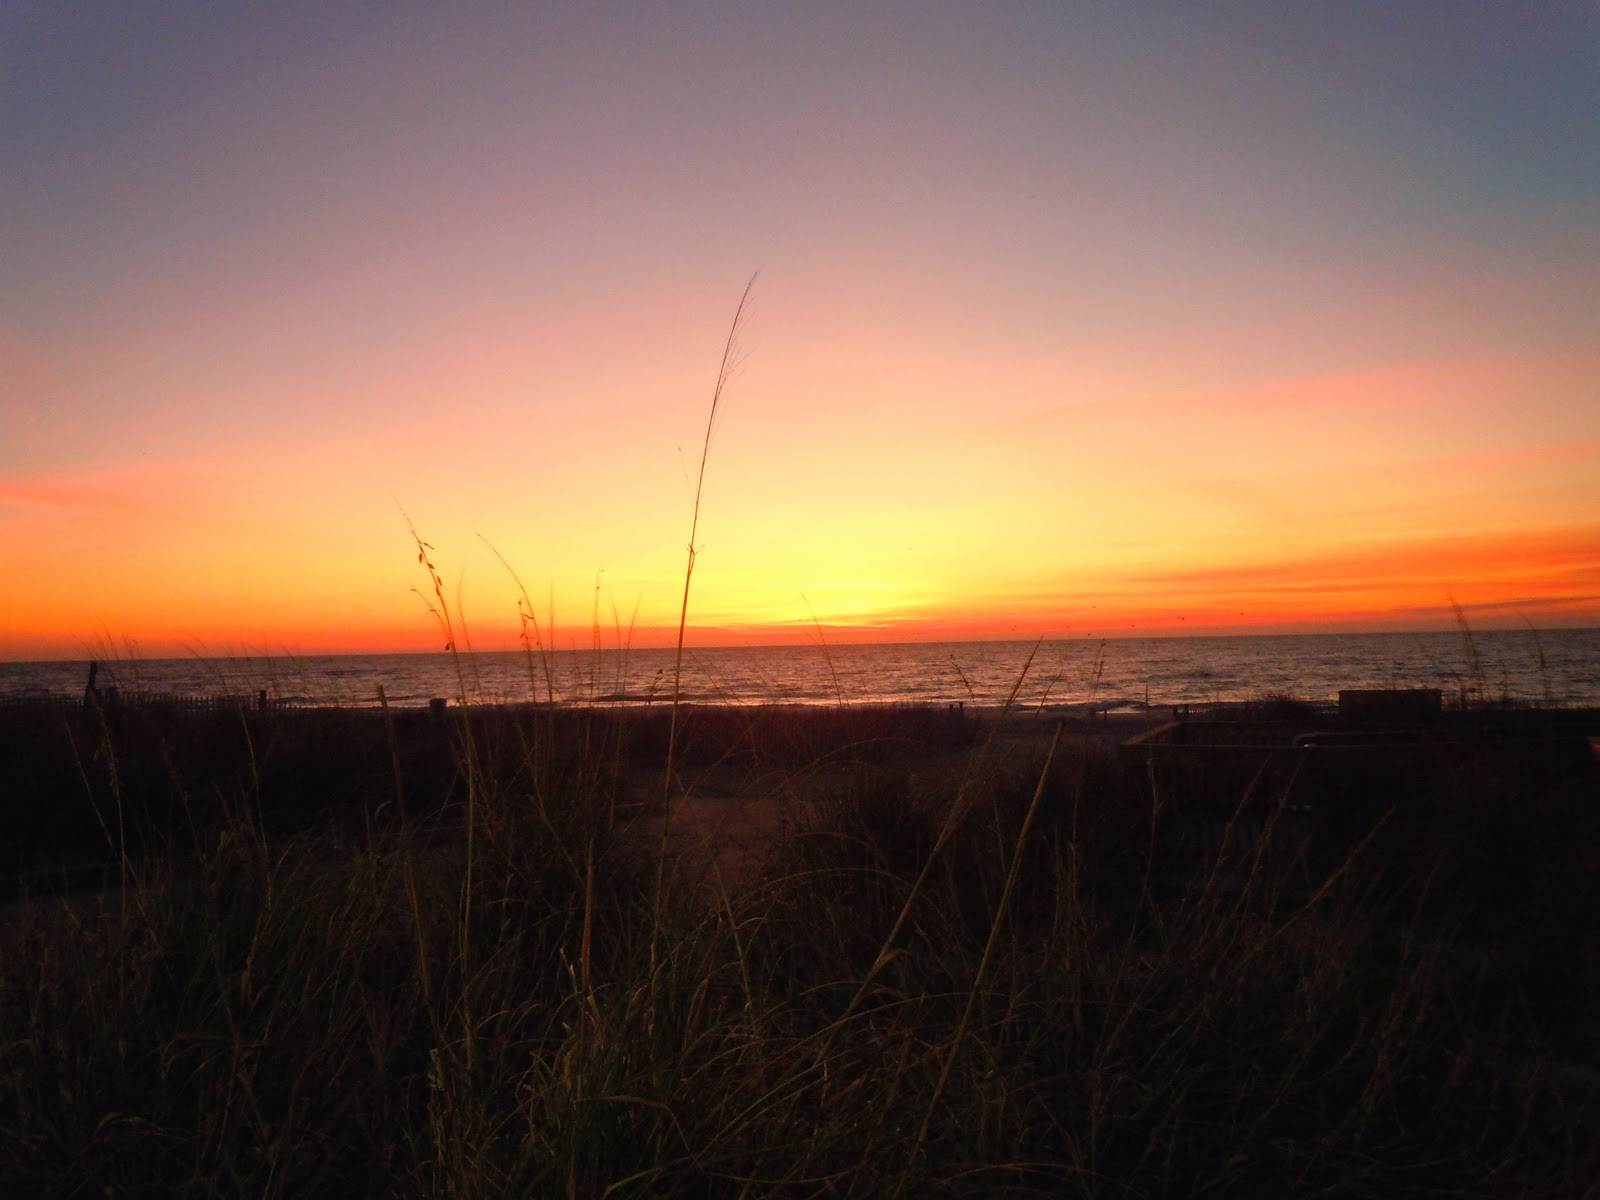 Sunrise Services At Myrtle Beach